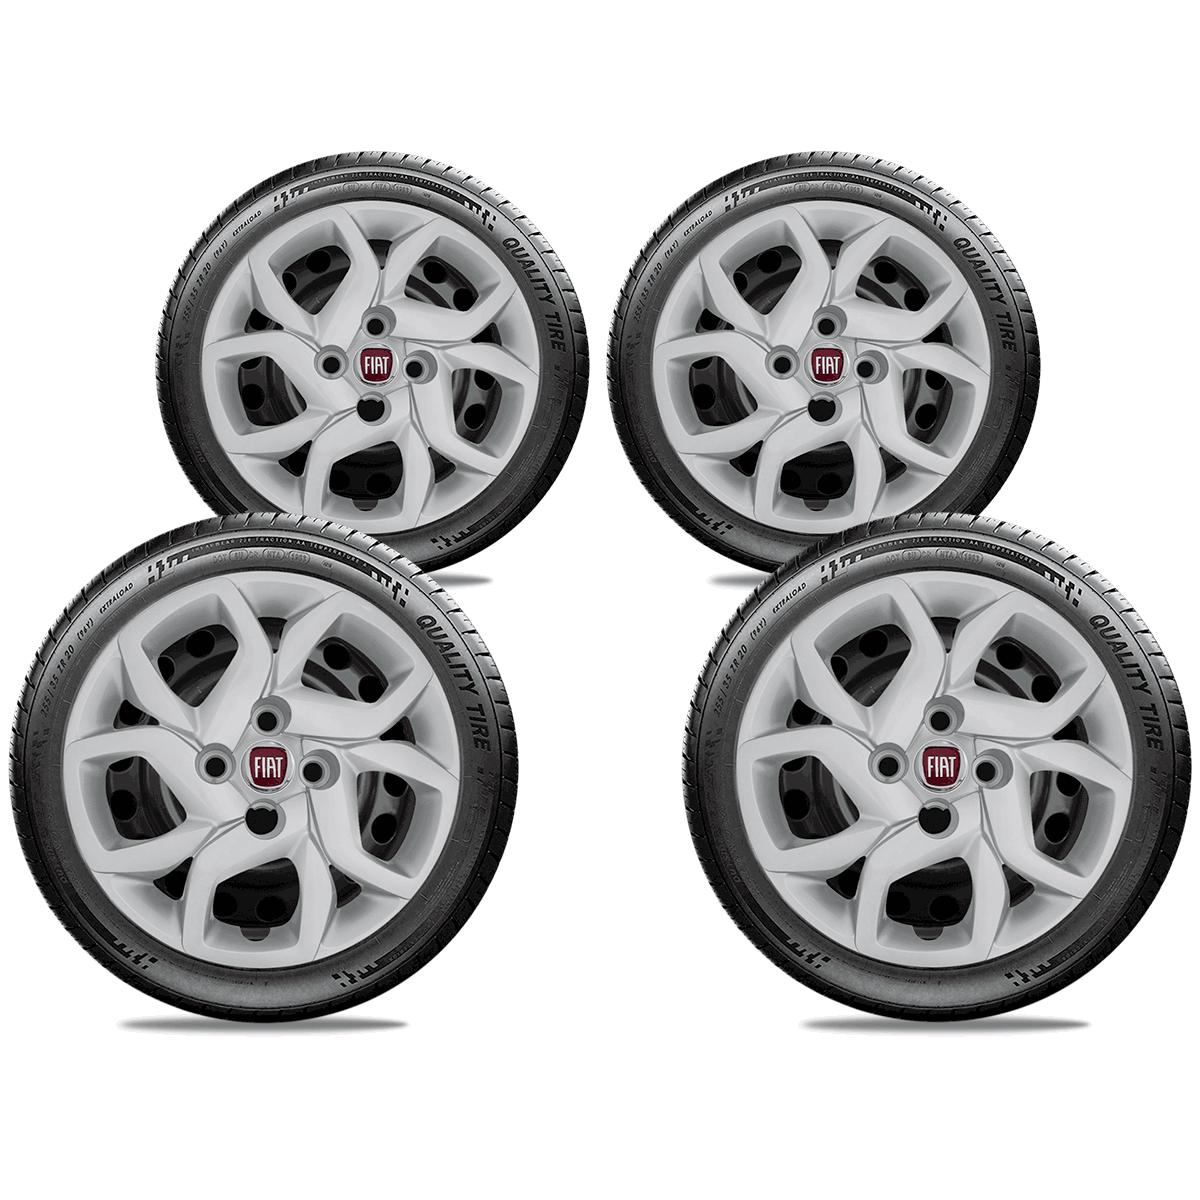 Calota Jogo 4Pçs Fiat Mobi 2017 2018 2019 Aro 14 G291J